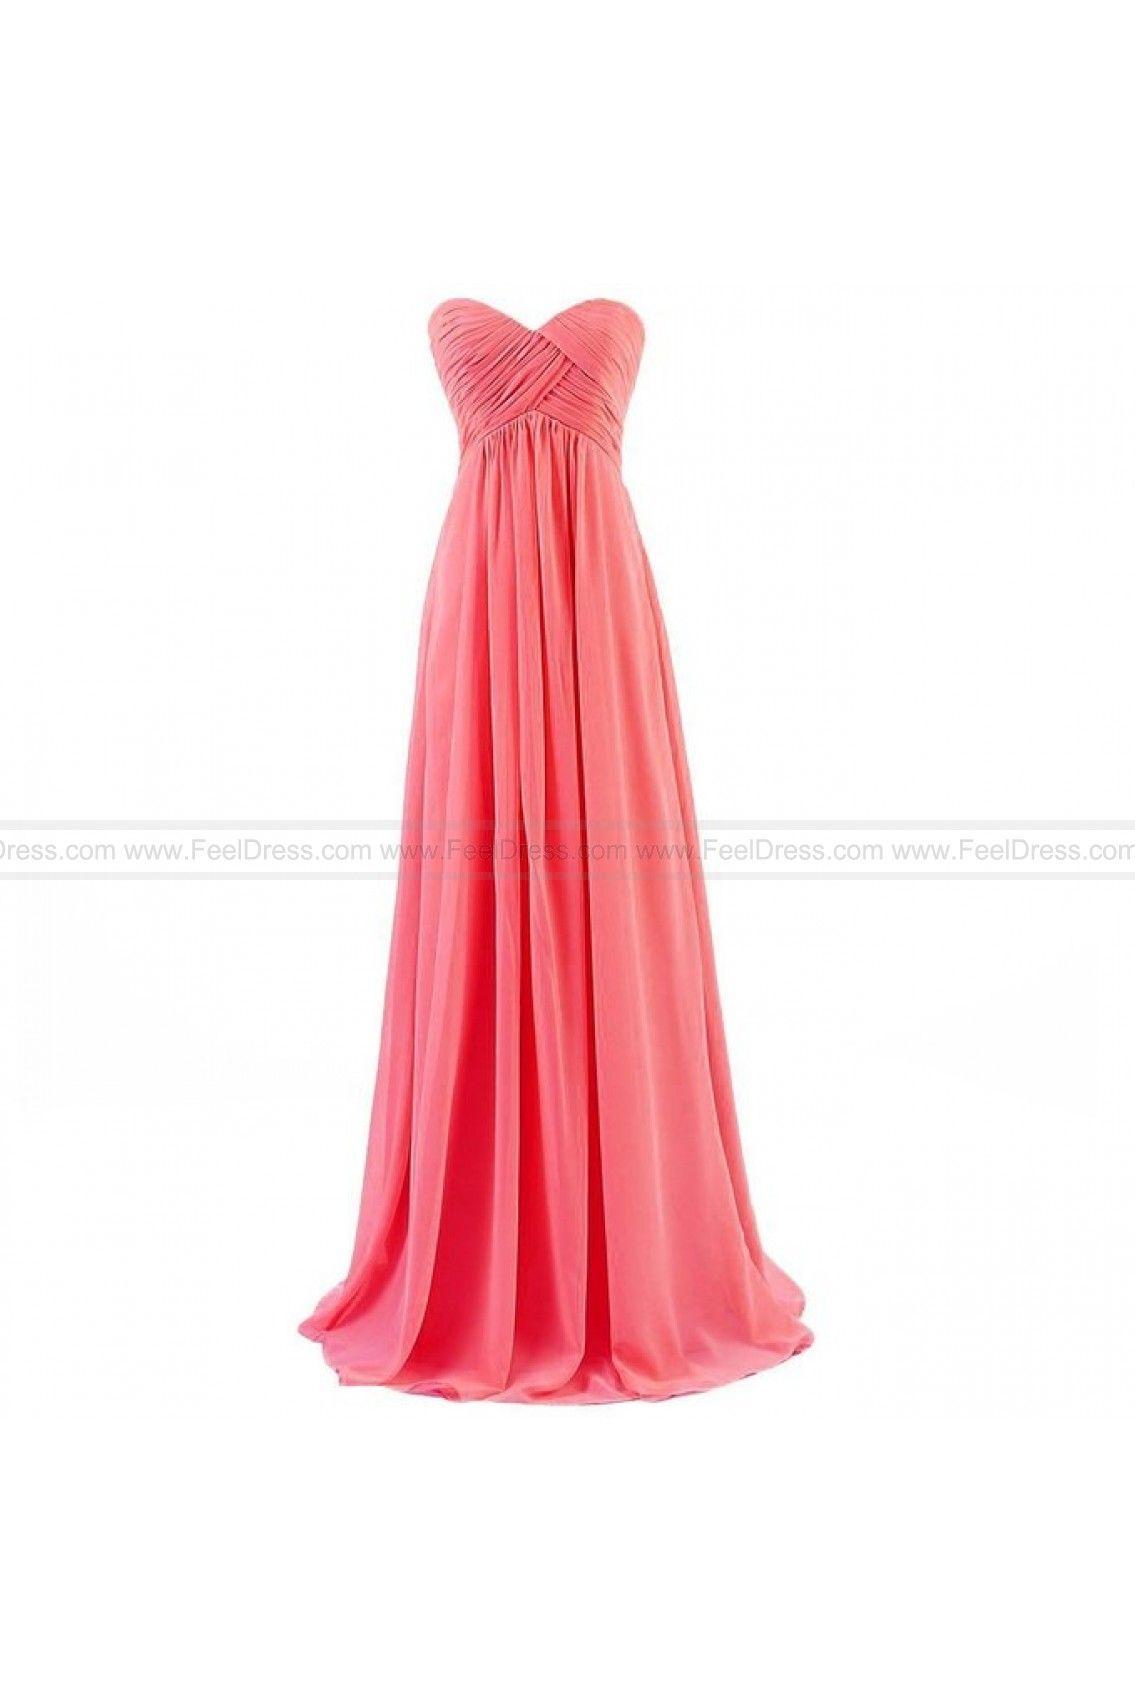 Simple sleeveless chiffon sweetheart floorlength long evening gowns